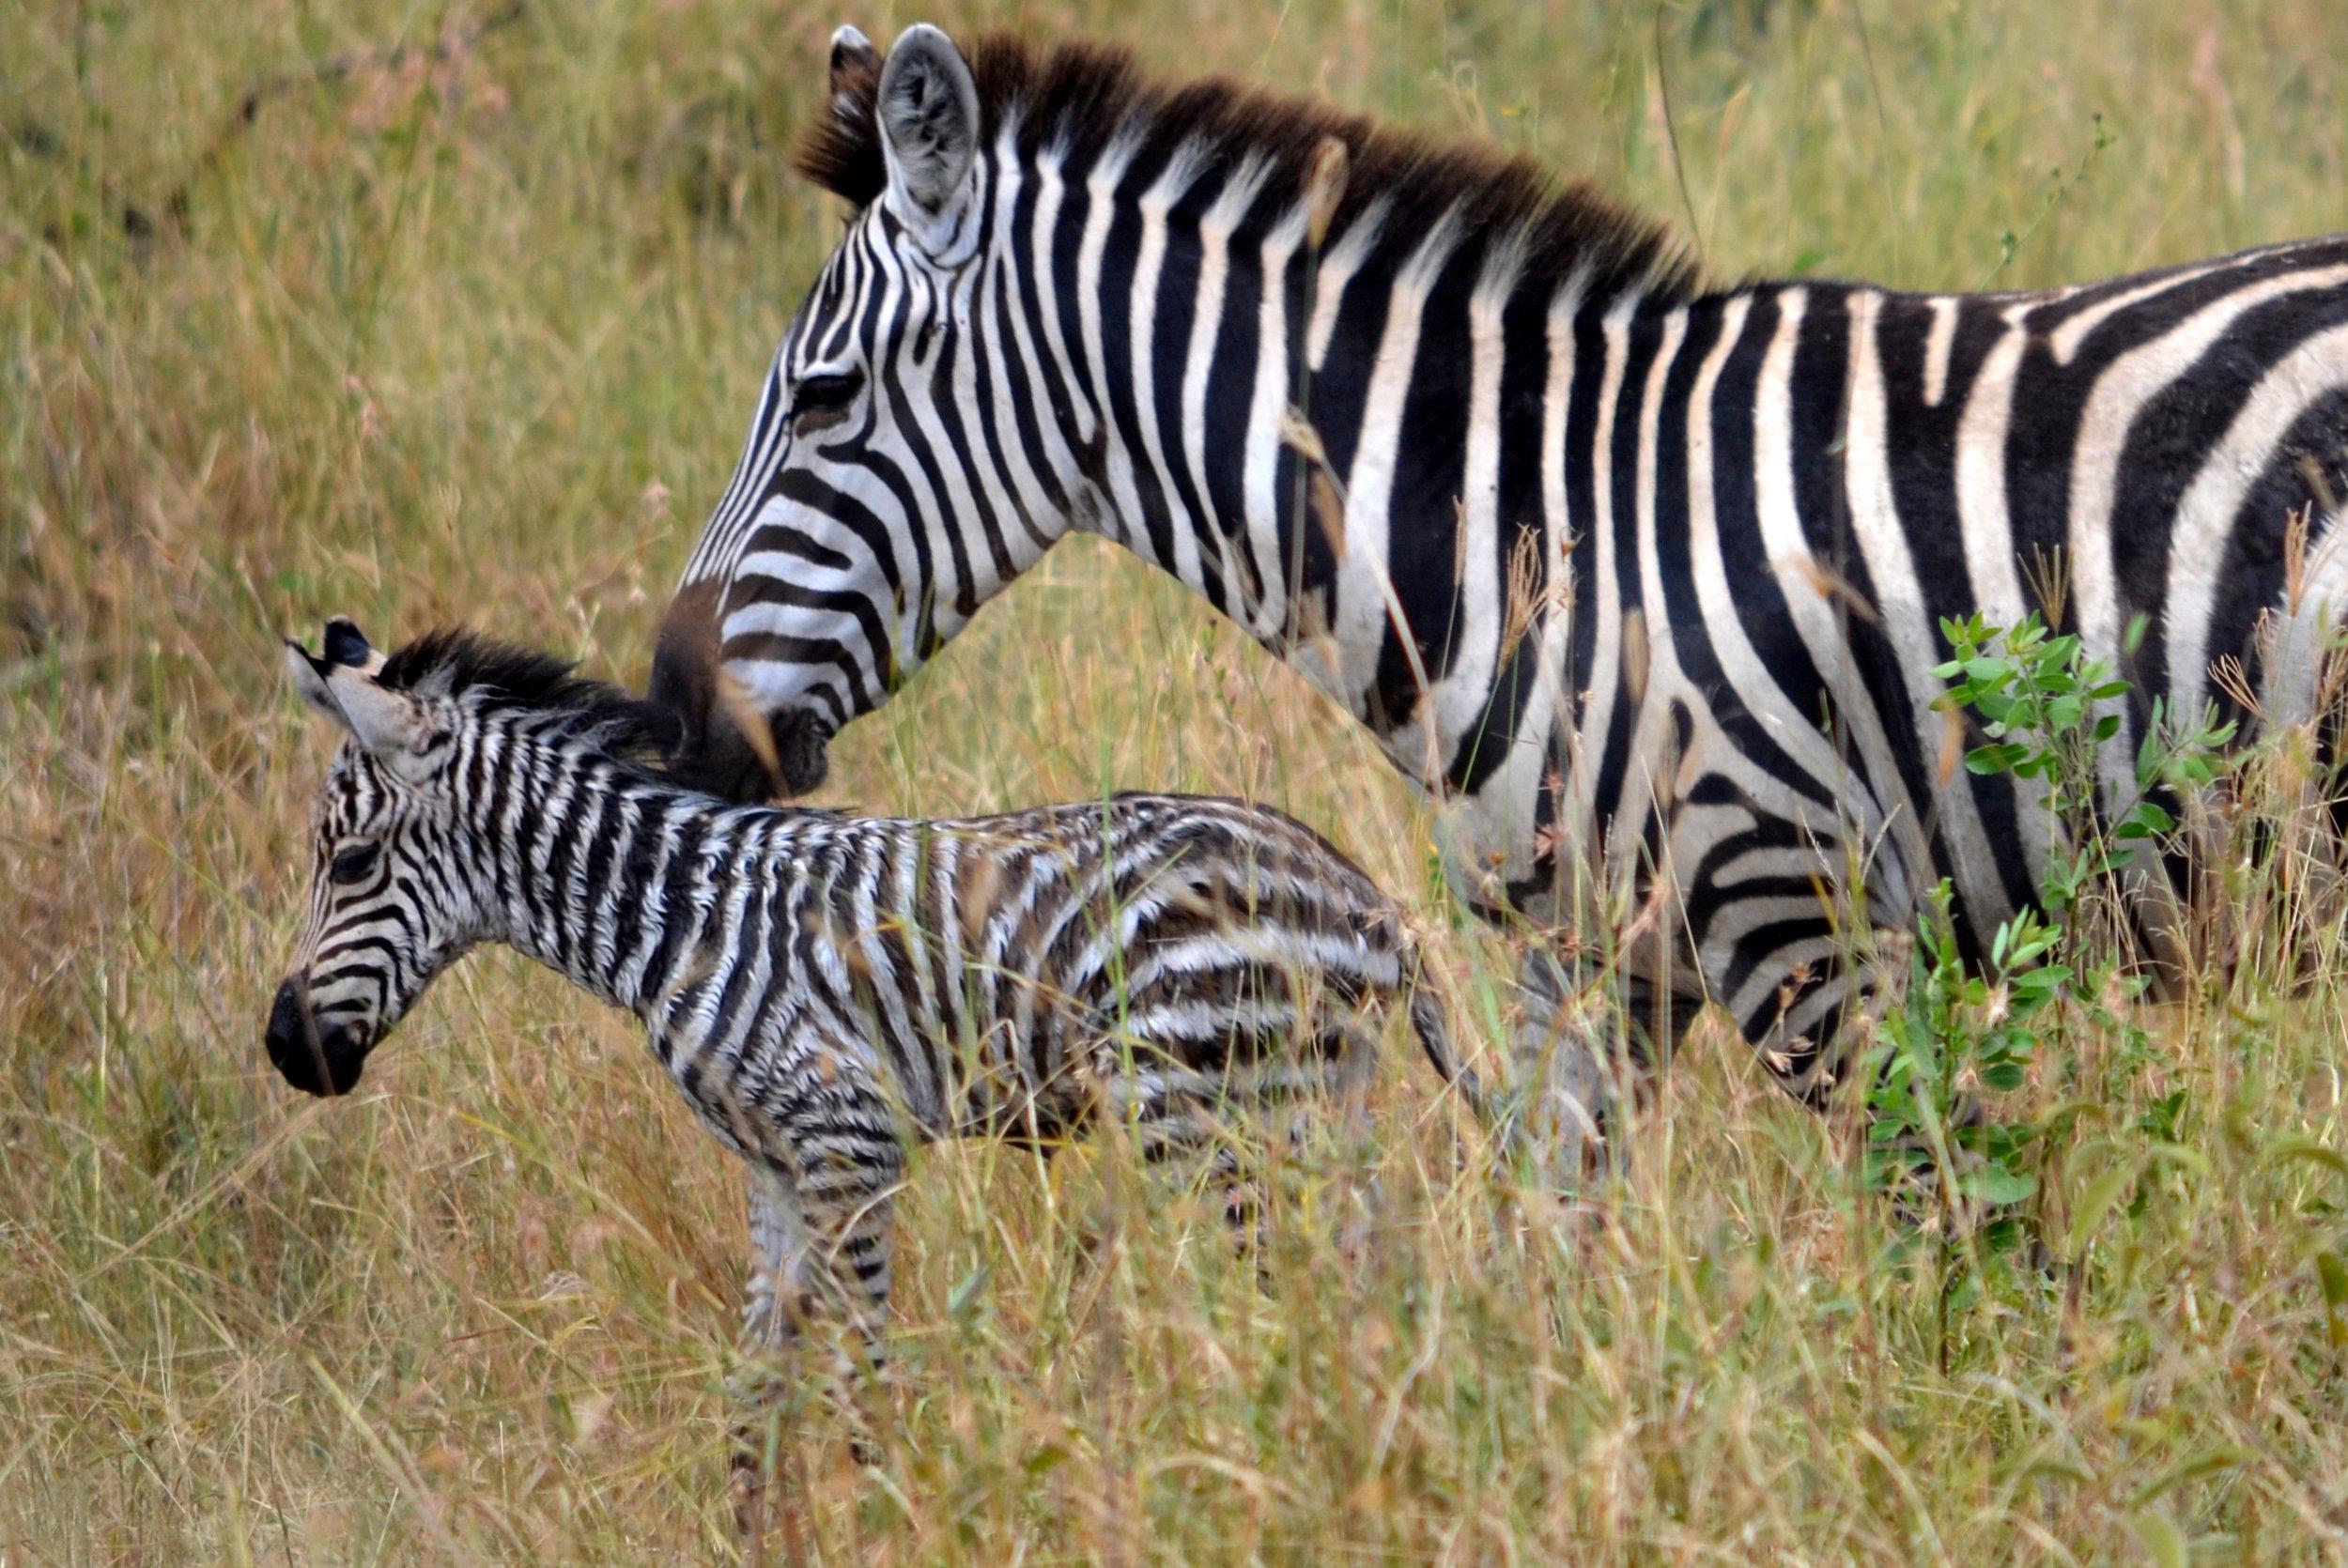 Copy of Zebra and newborn foal on Serengeti (AF017)